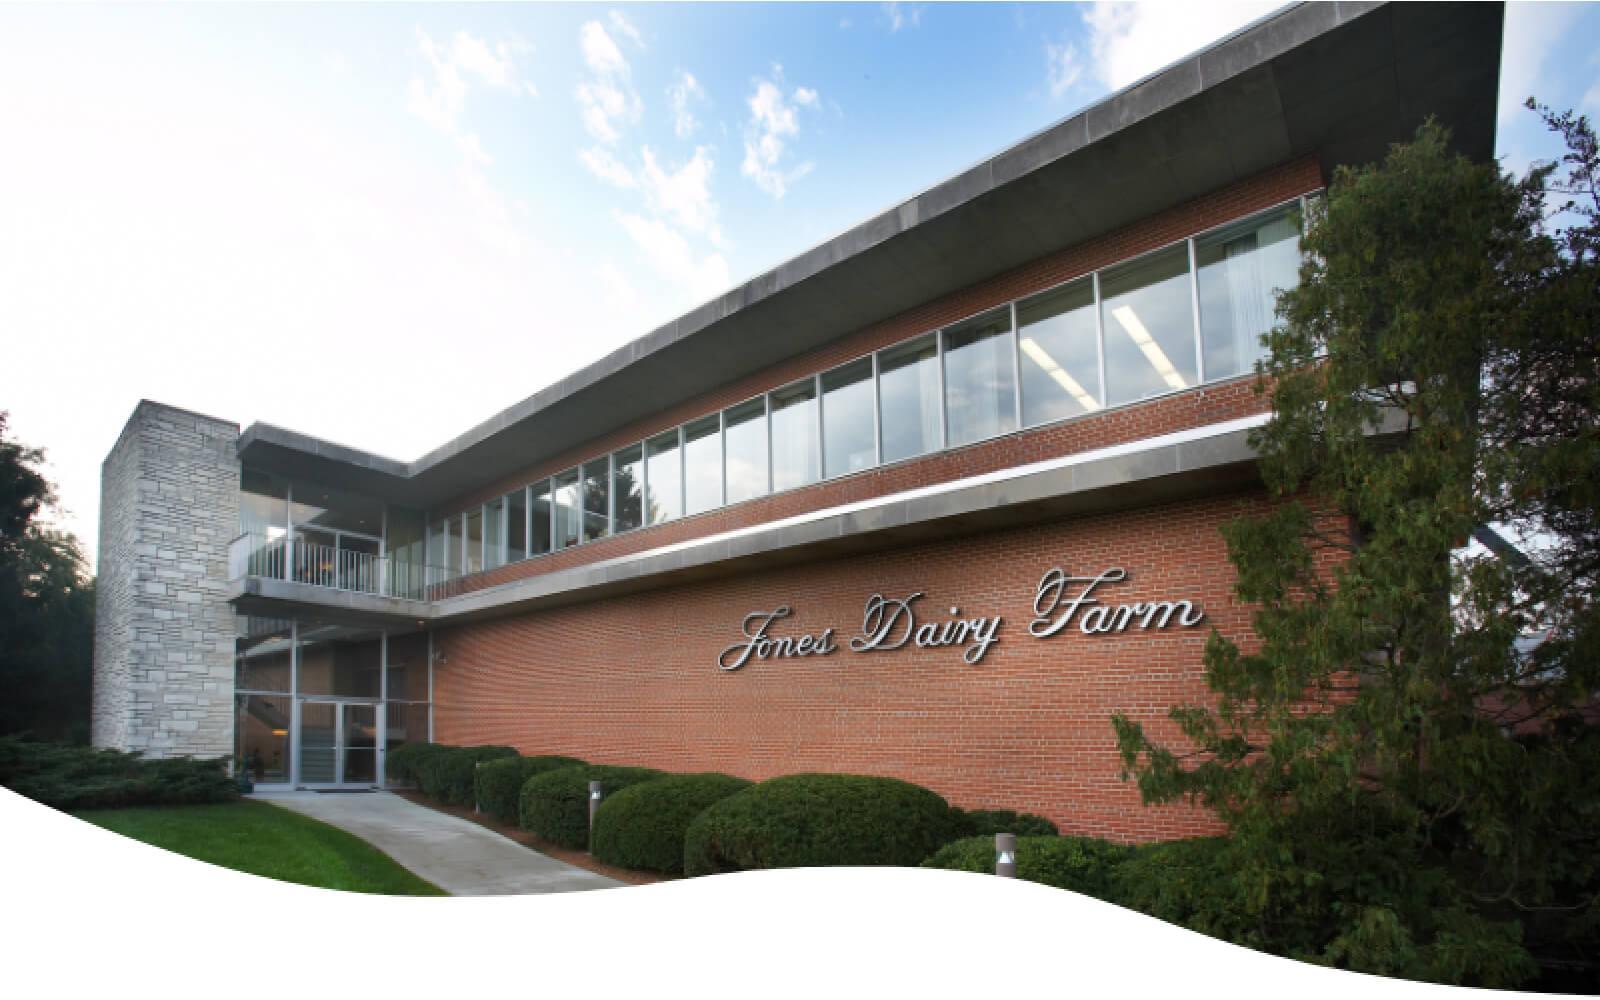 Jones Dairy Farm Office